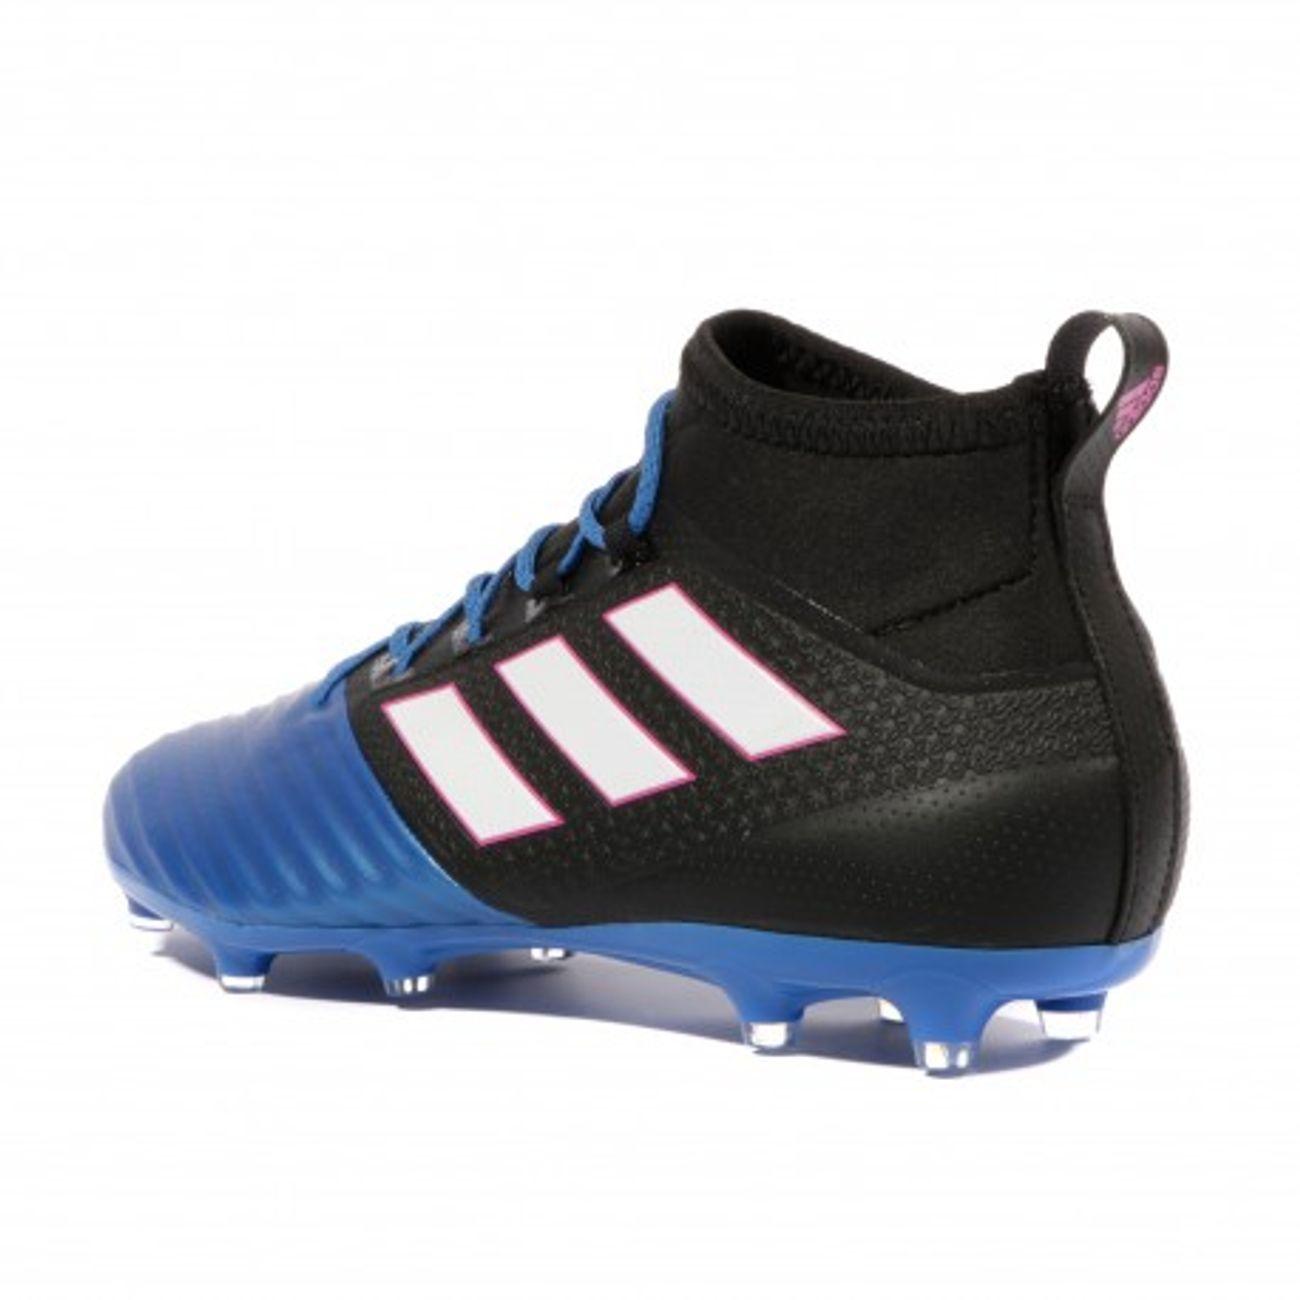 new styles 80c7e 7eea2 ... homme ADIDAS Ace 17.2 Primemesh FG Homme Chaussures Football Noir Bleu  Adidas